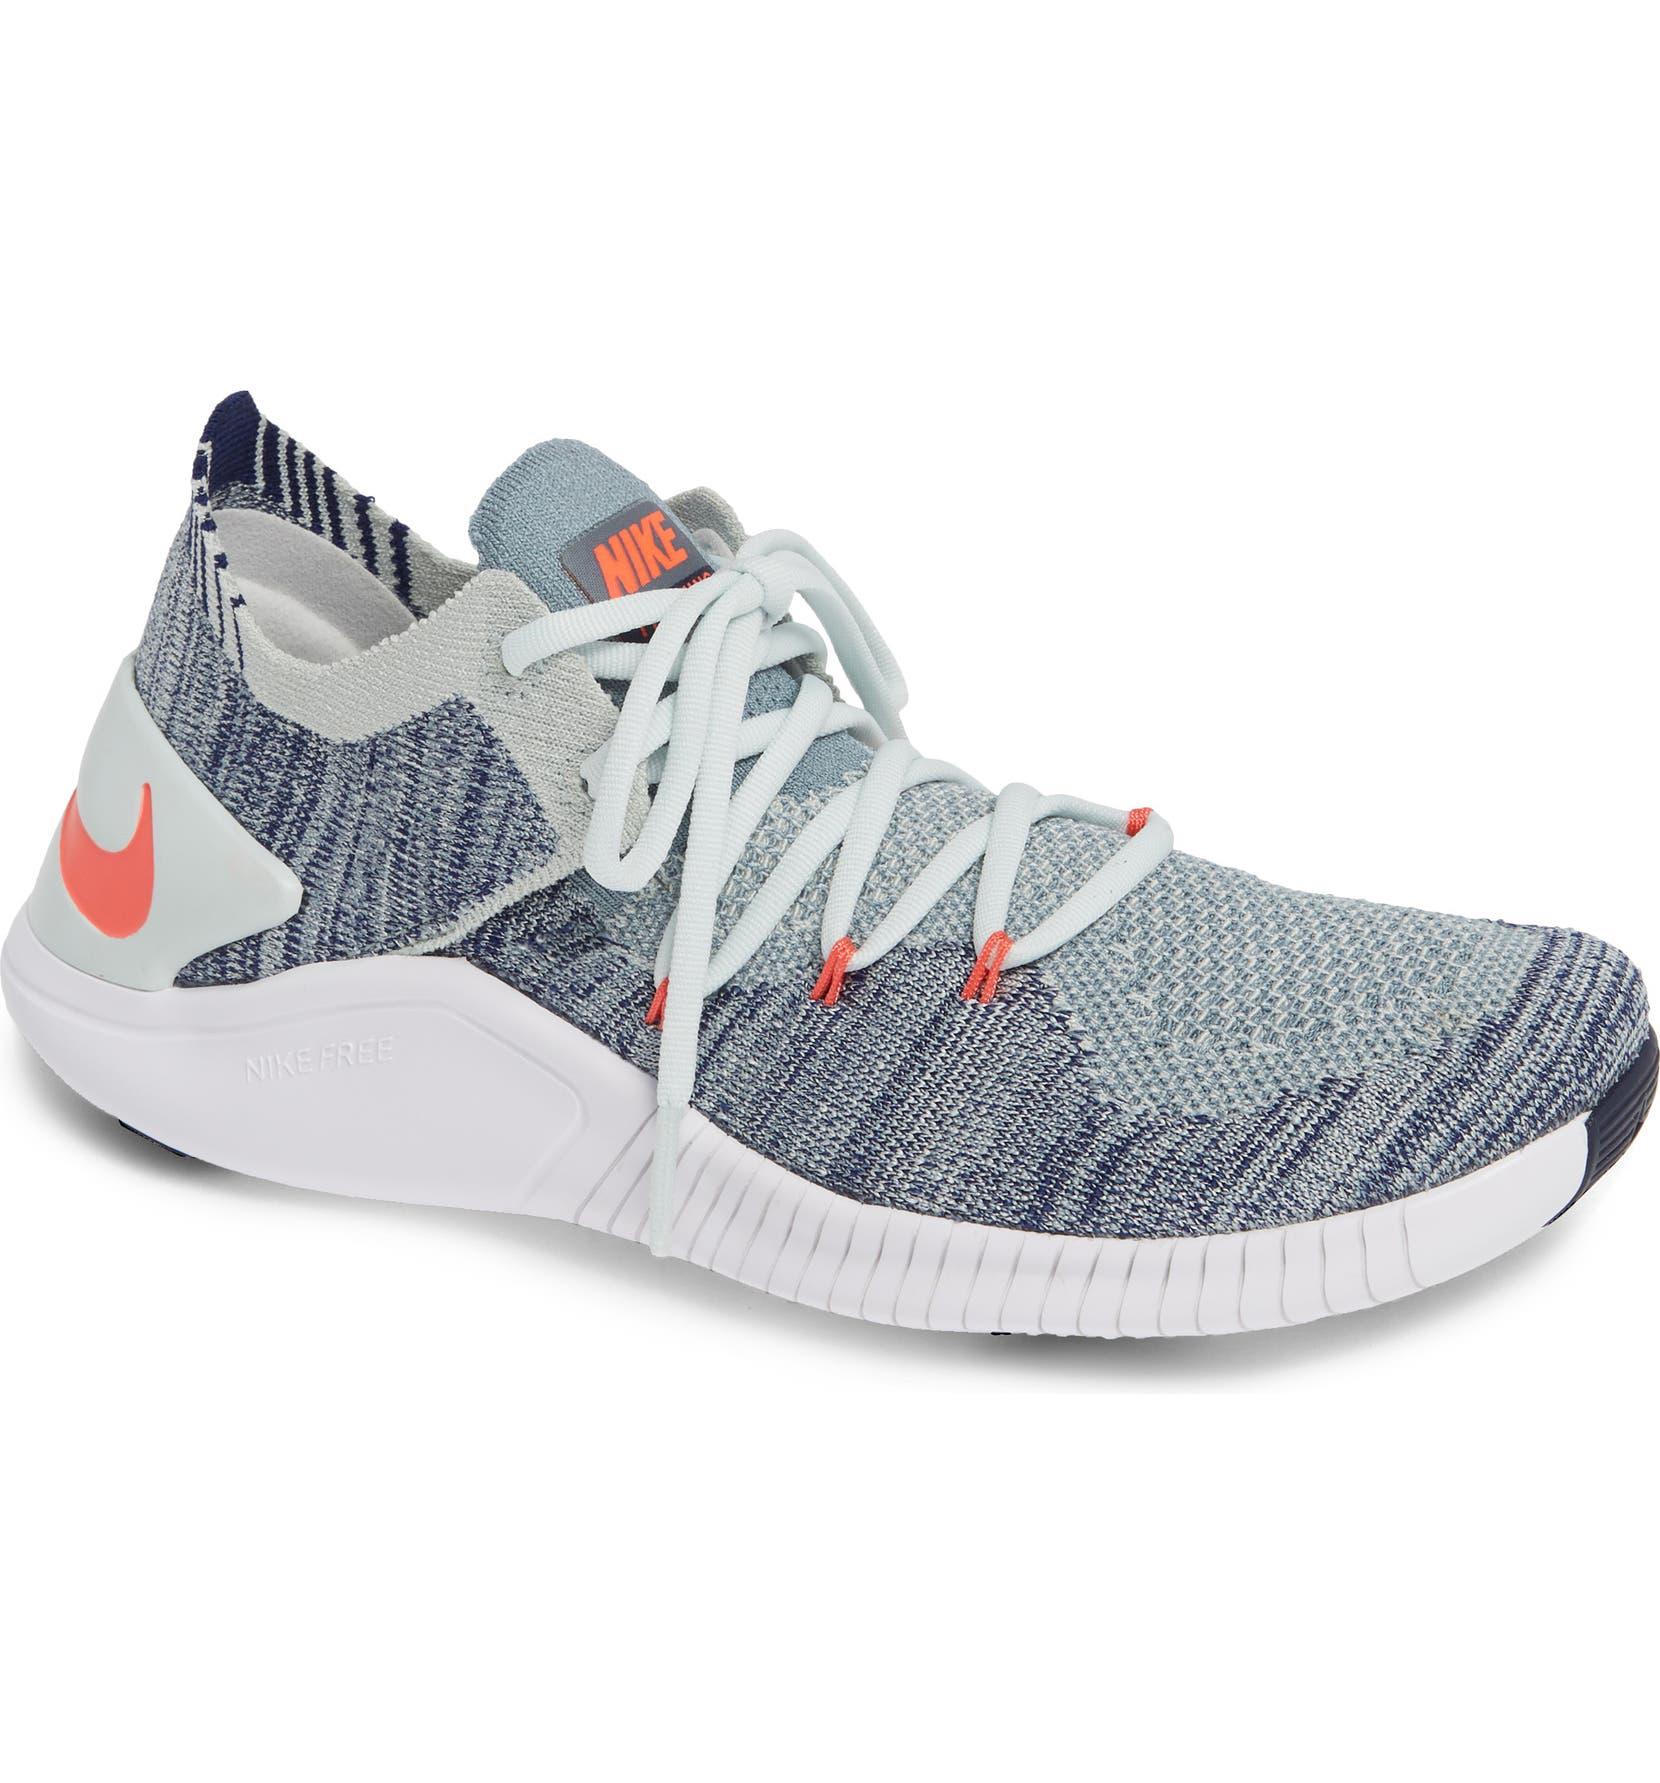 premium selection 8b3b1 1a760 Nike Free TR Flyknit 3 Training Shoe (Women)   Nordstrom